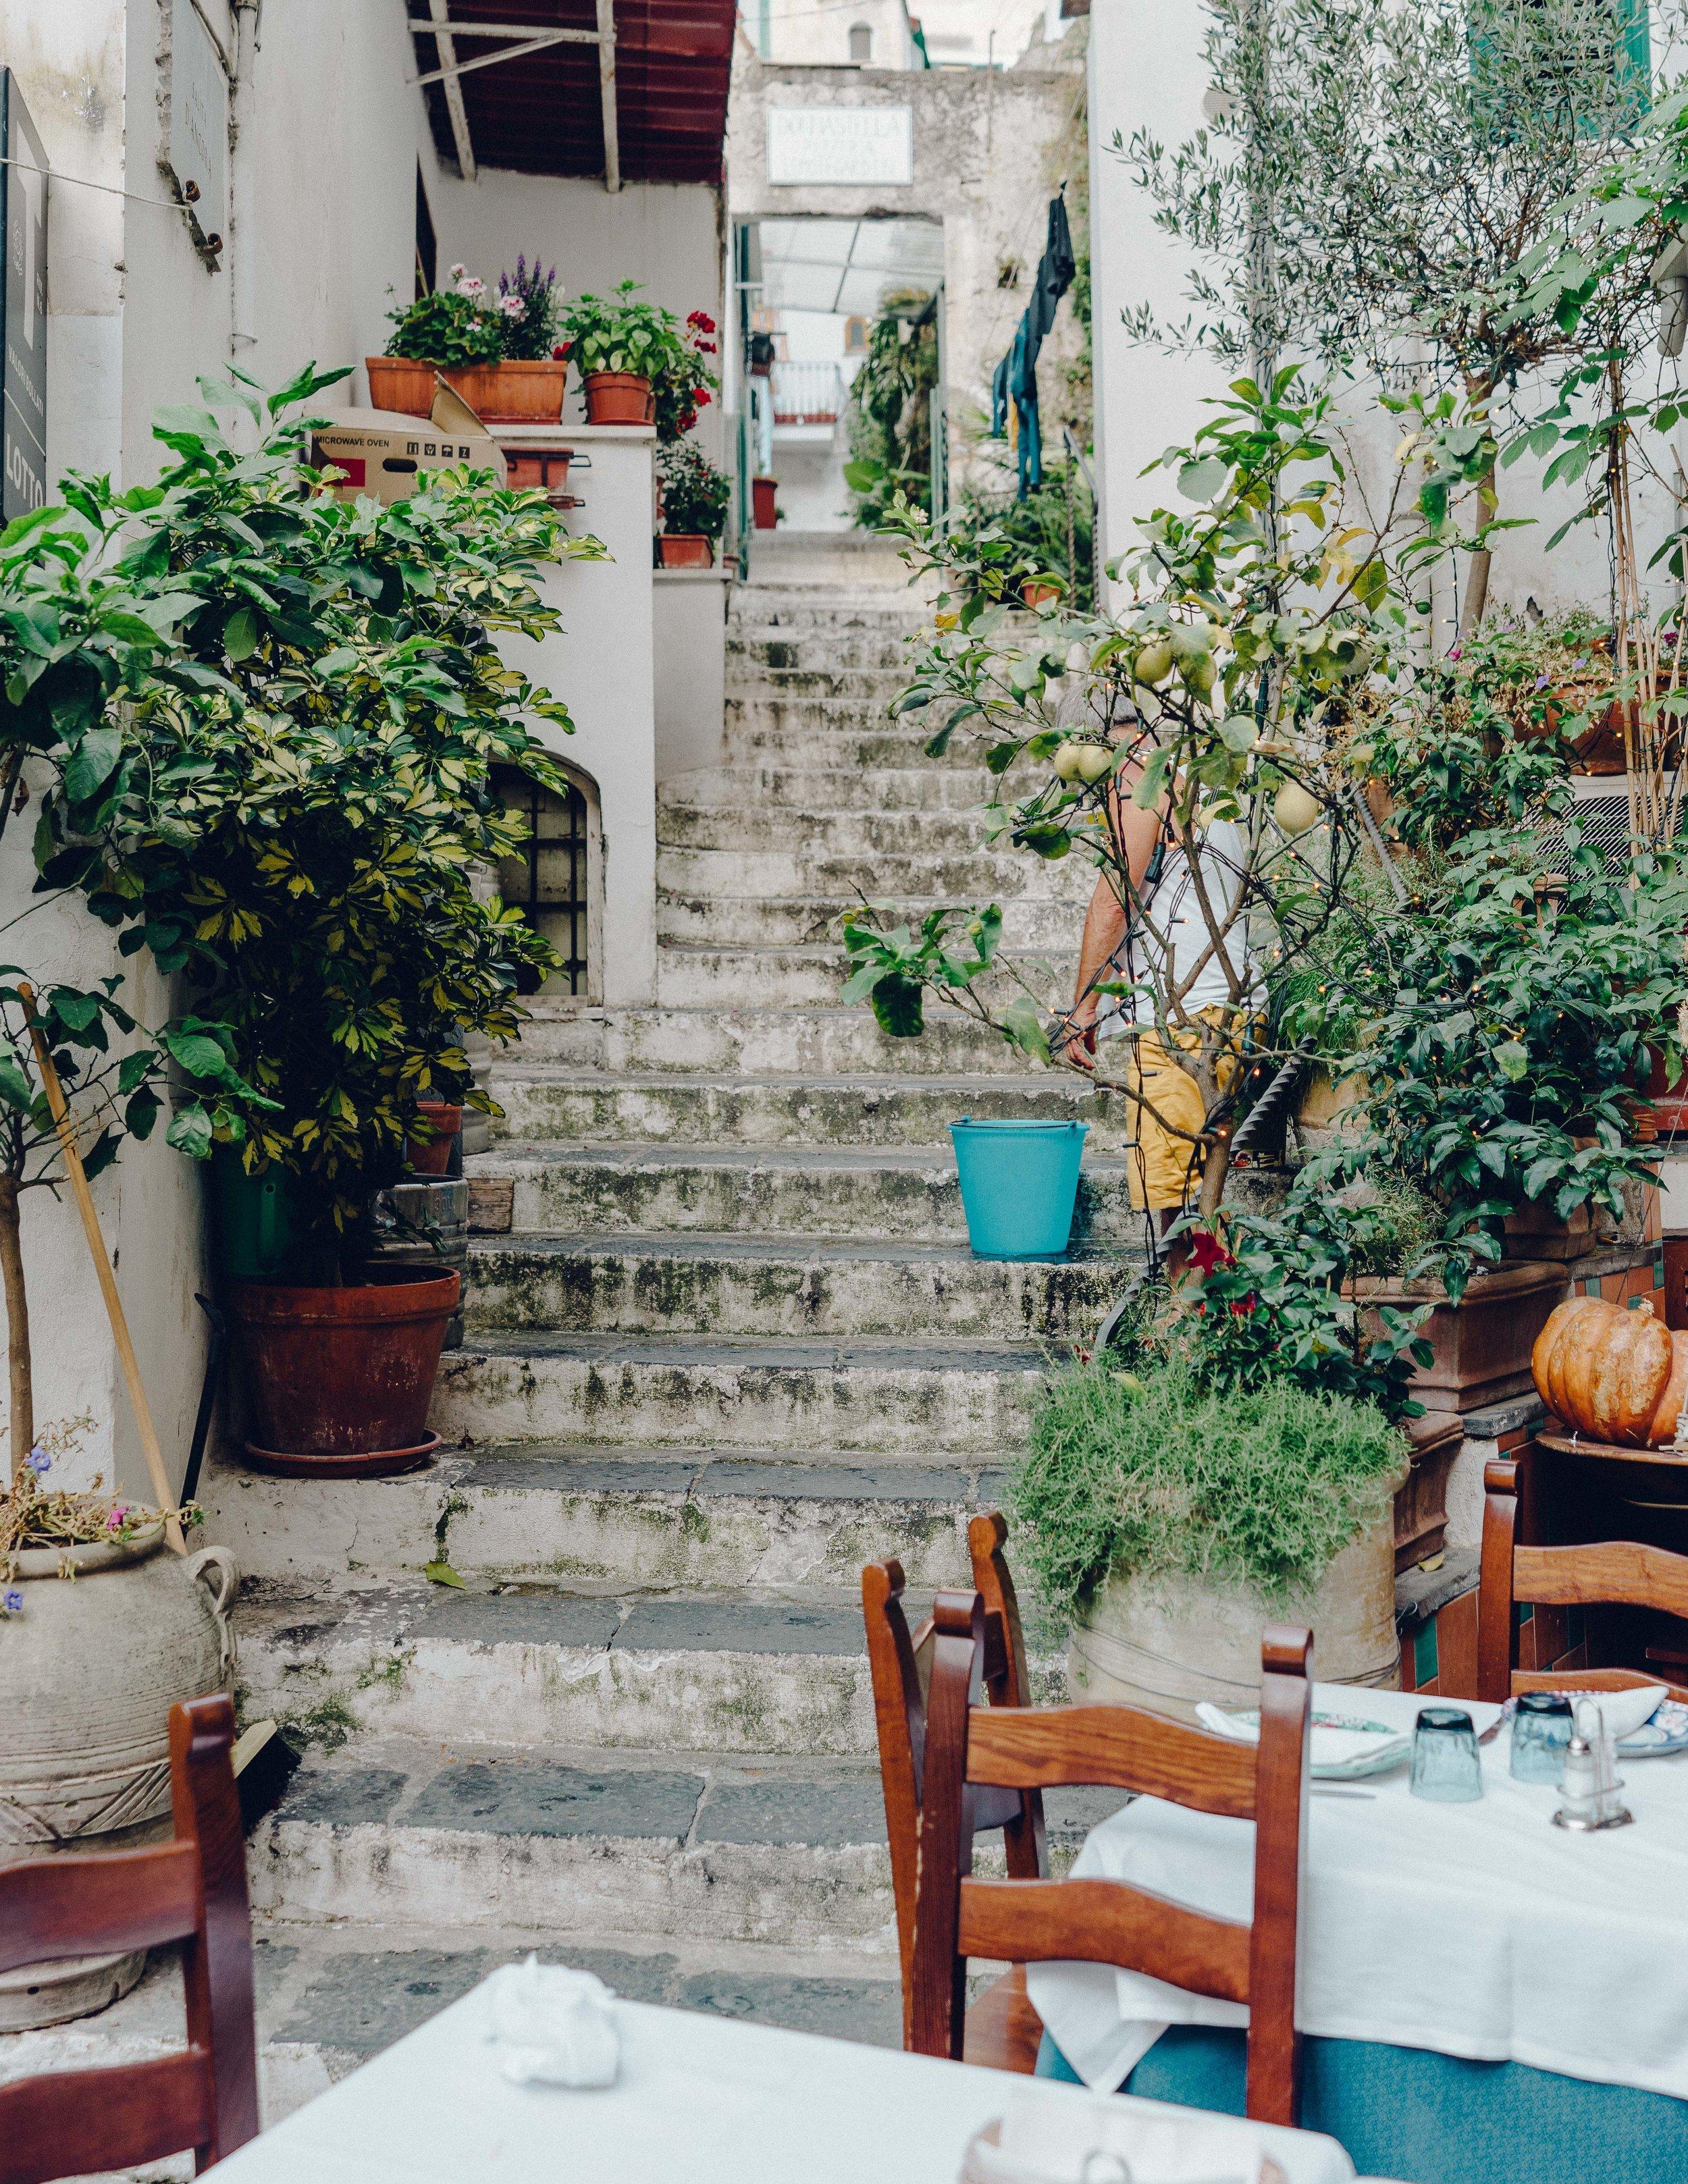 ASROSENVINGE_Roadtrip_Italy_Puglia_Amalfi-07558.jpg